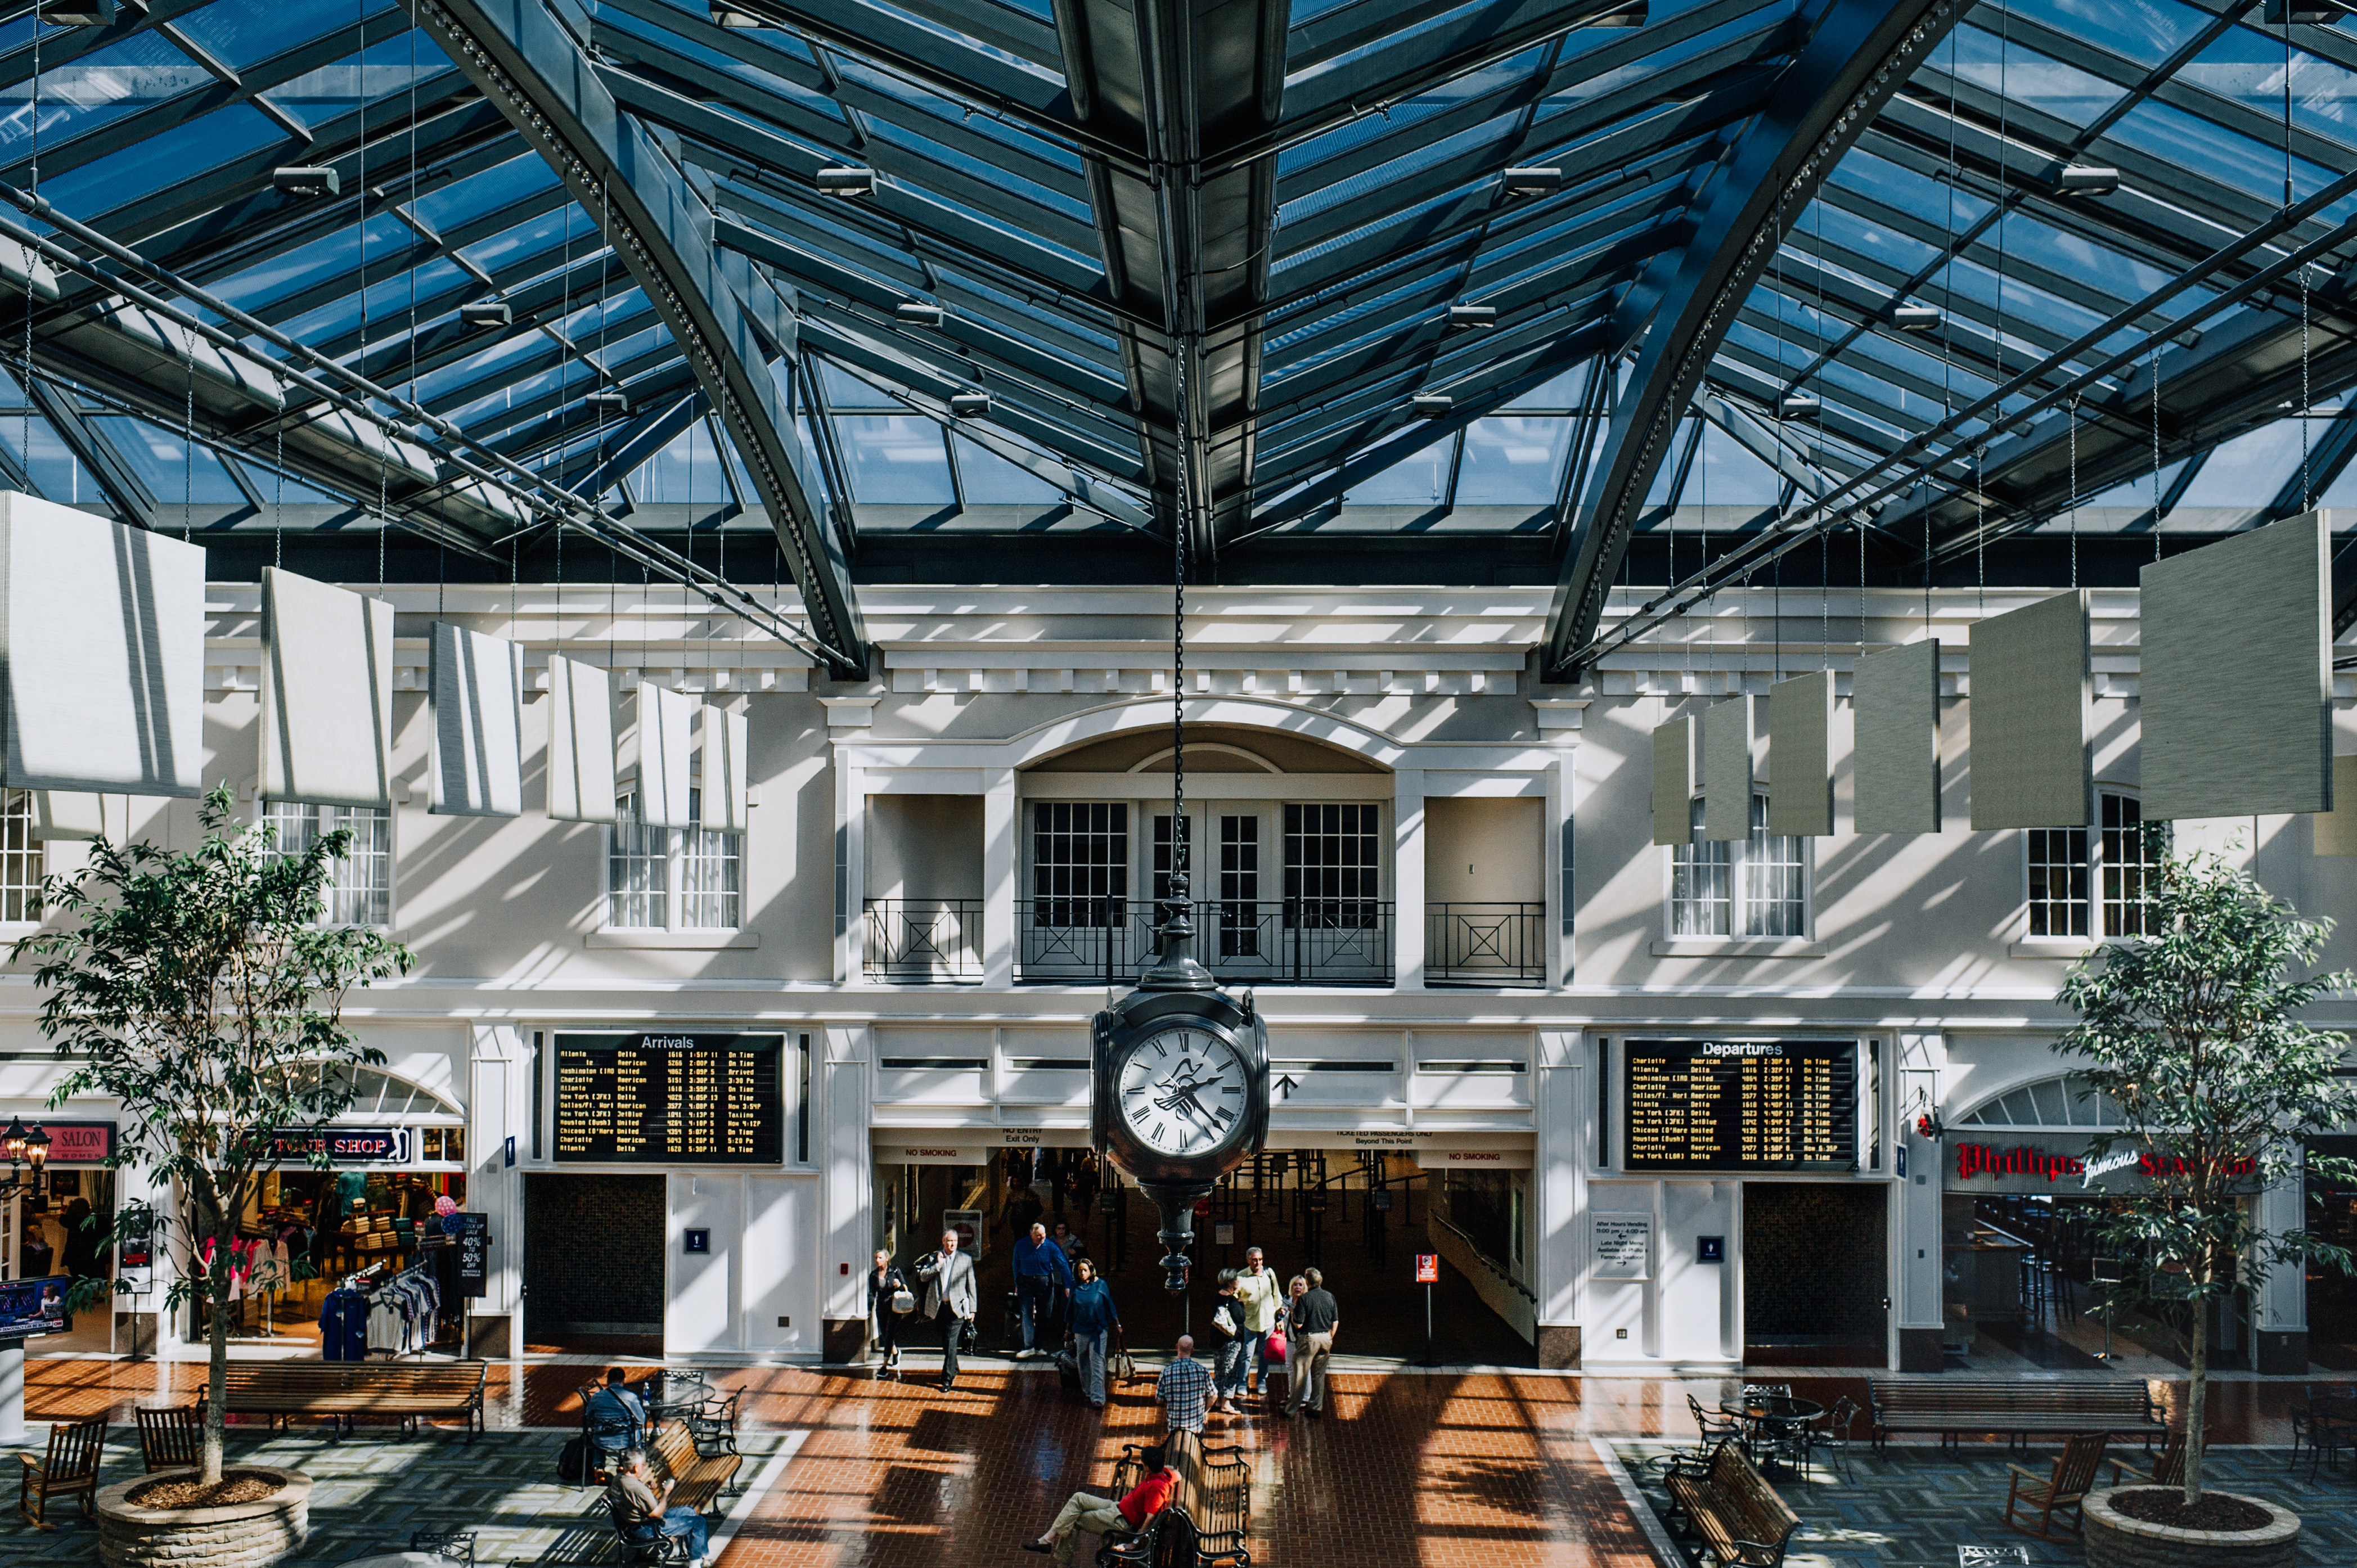 Savannah/Hilton Head International Airport